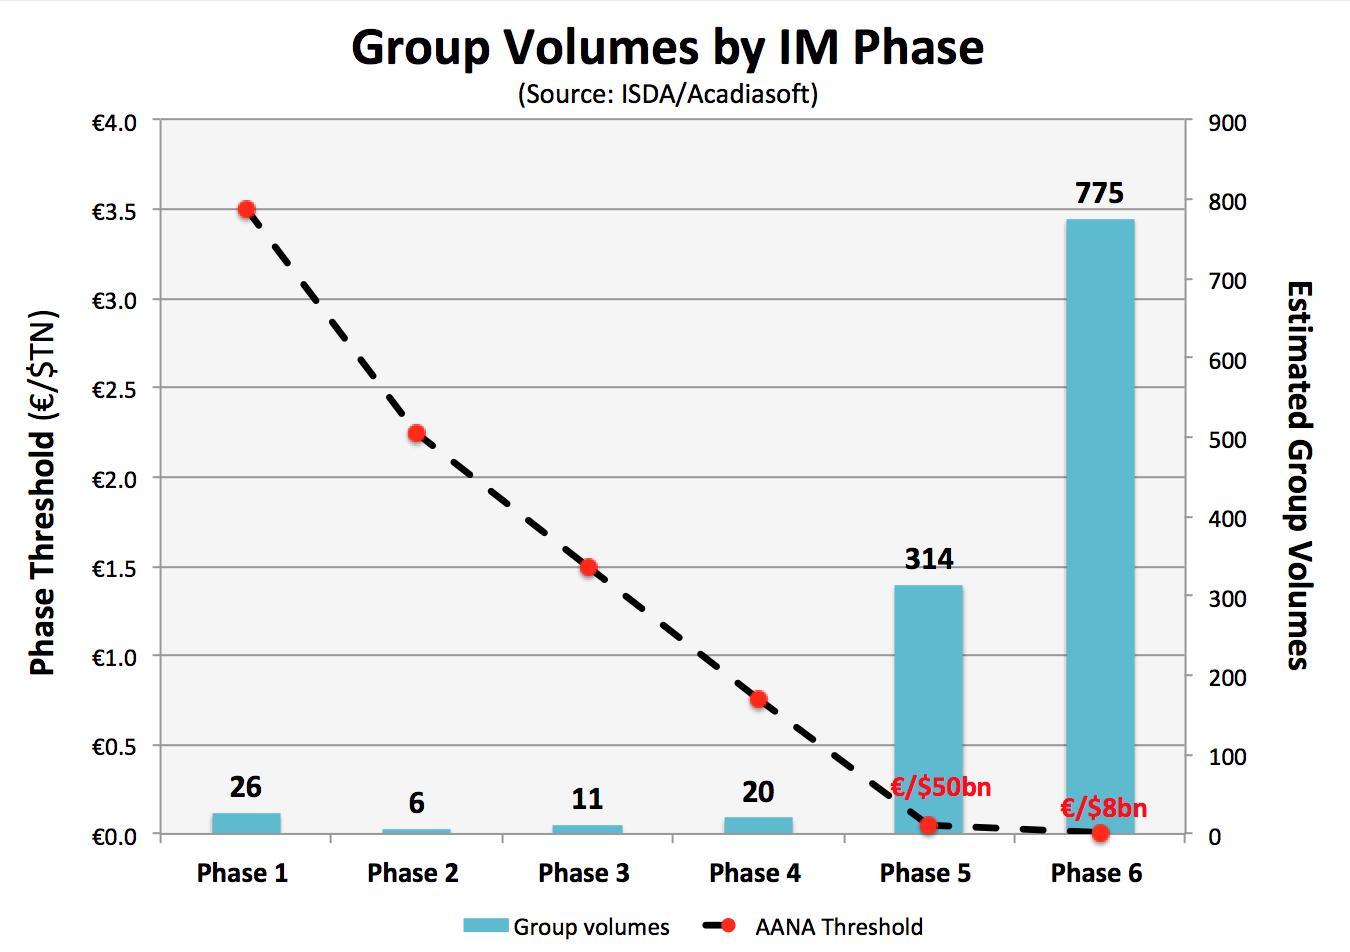 Group volume estimates by IM Phase